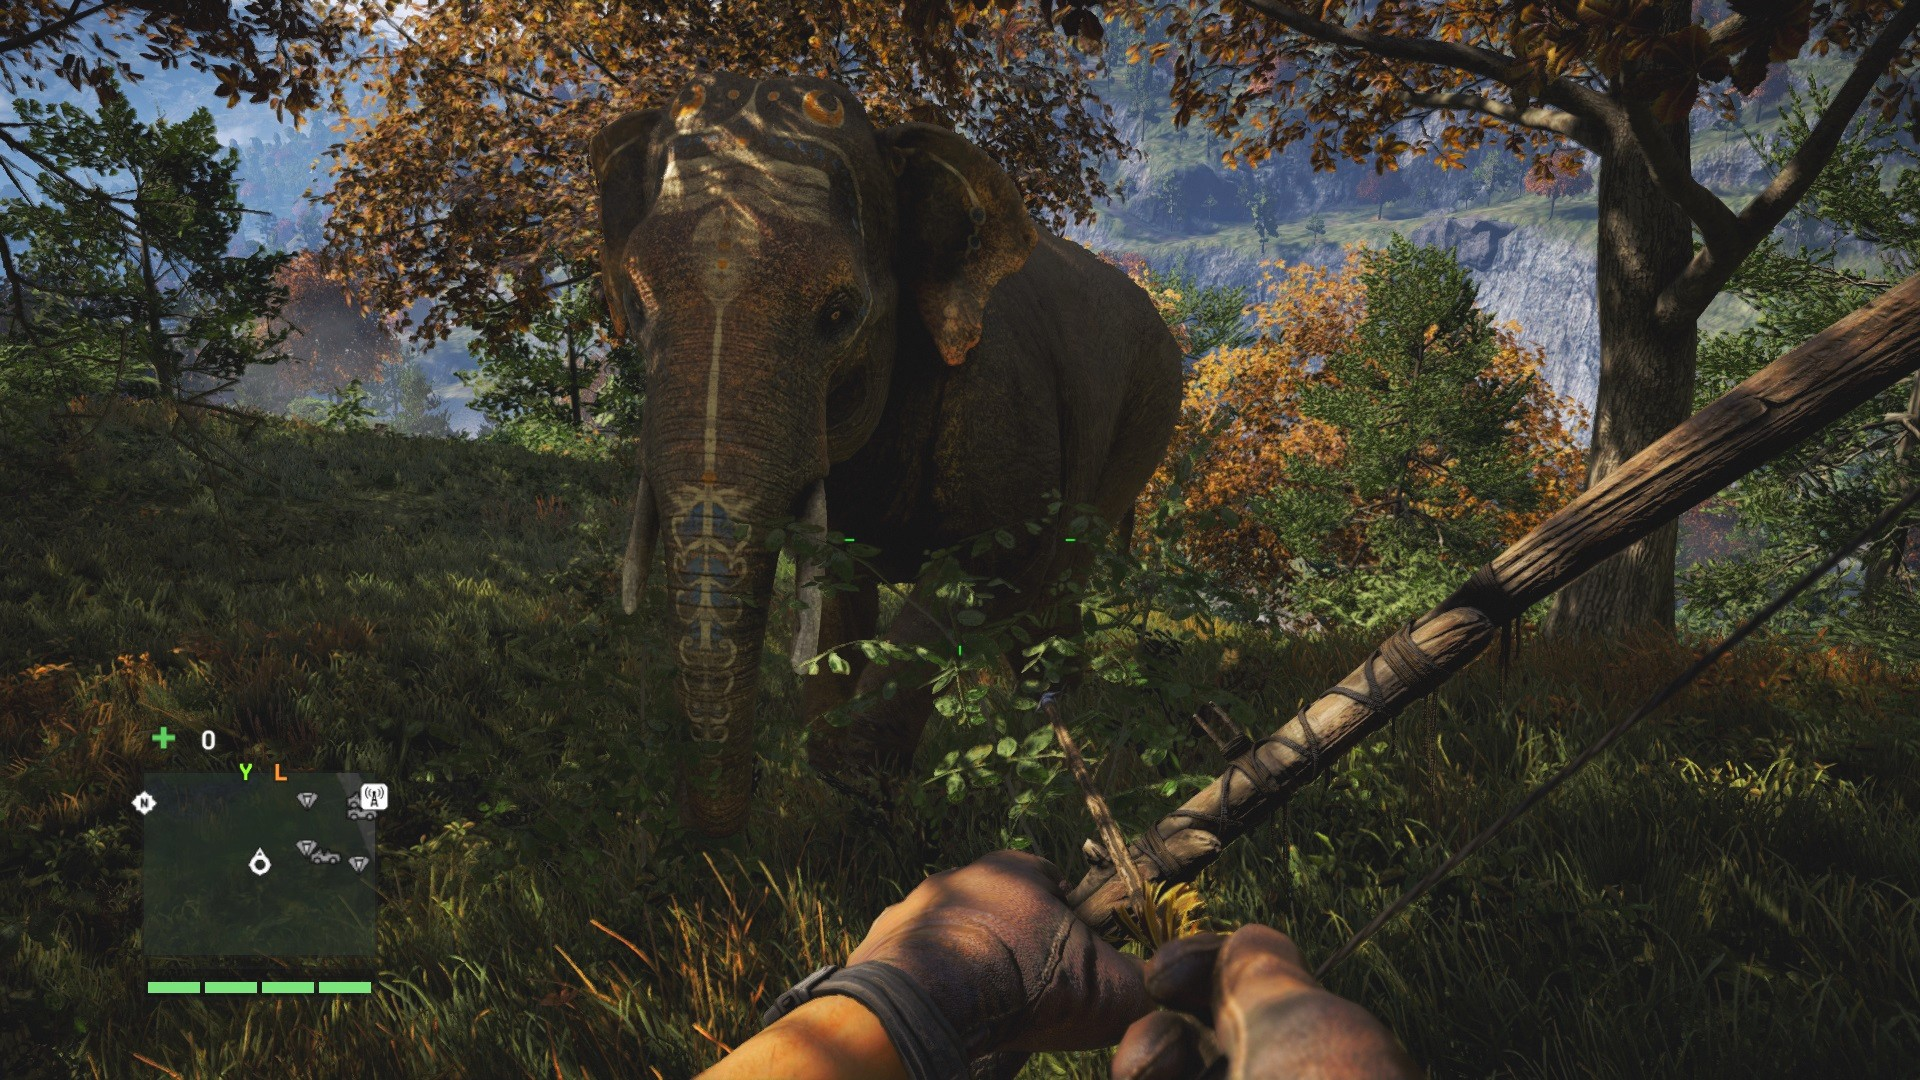 Far Cry 4 Wallpaper Elephant: Far Cry 4 Elephant Avec Peinture By MillianaRose On DeviantArt